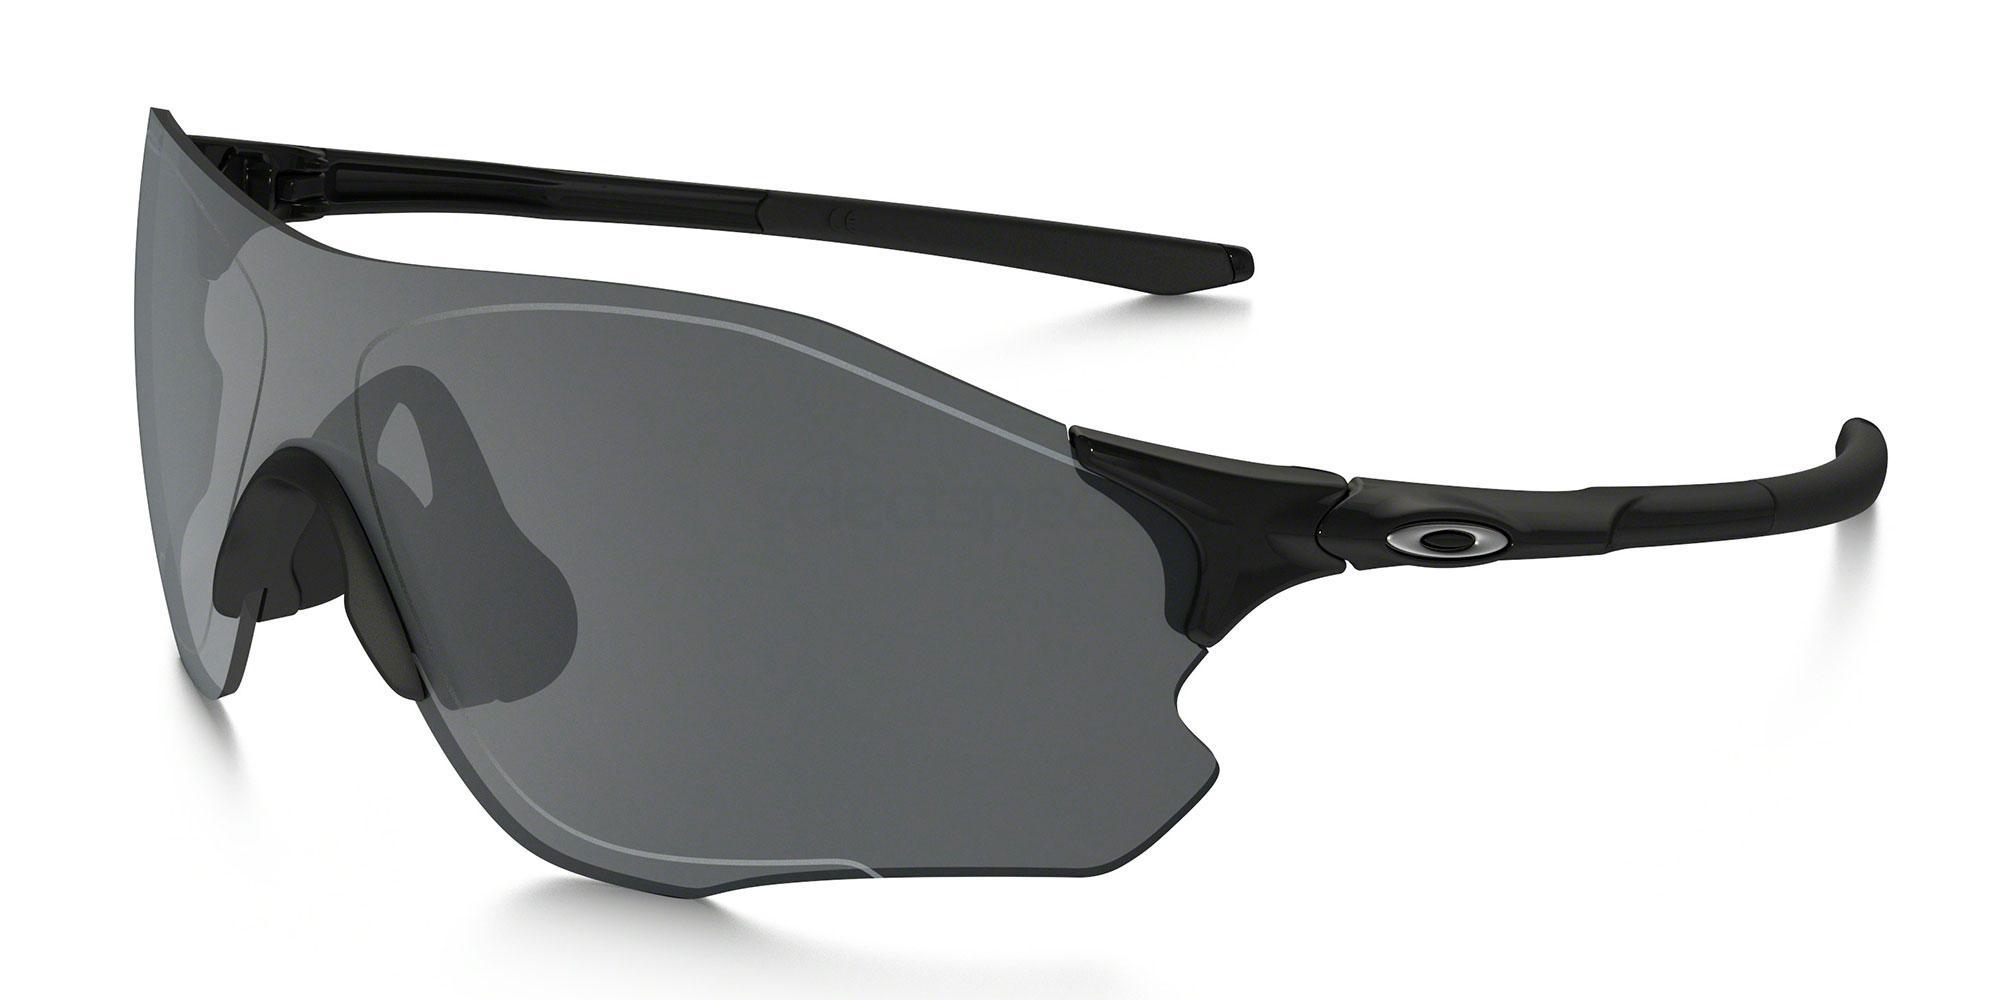 men's sunglasses trends 2016